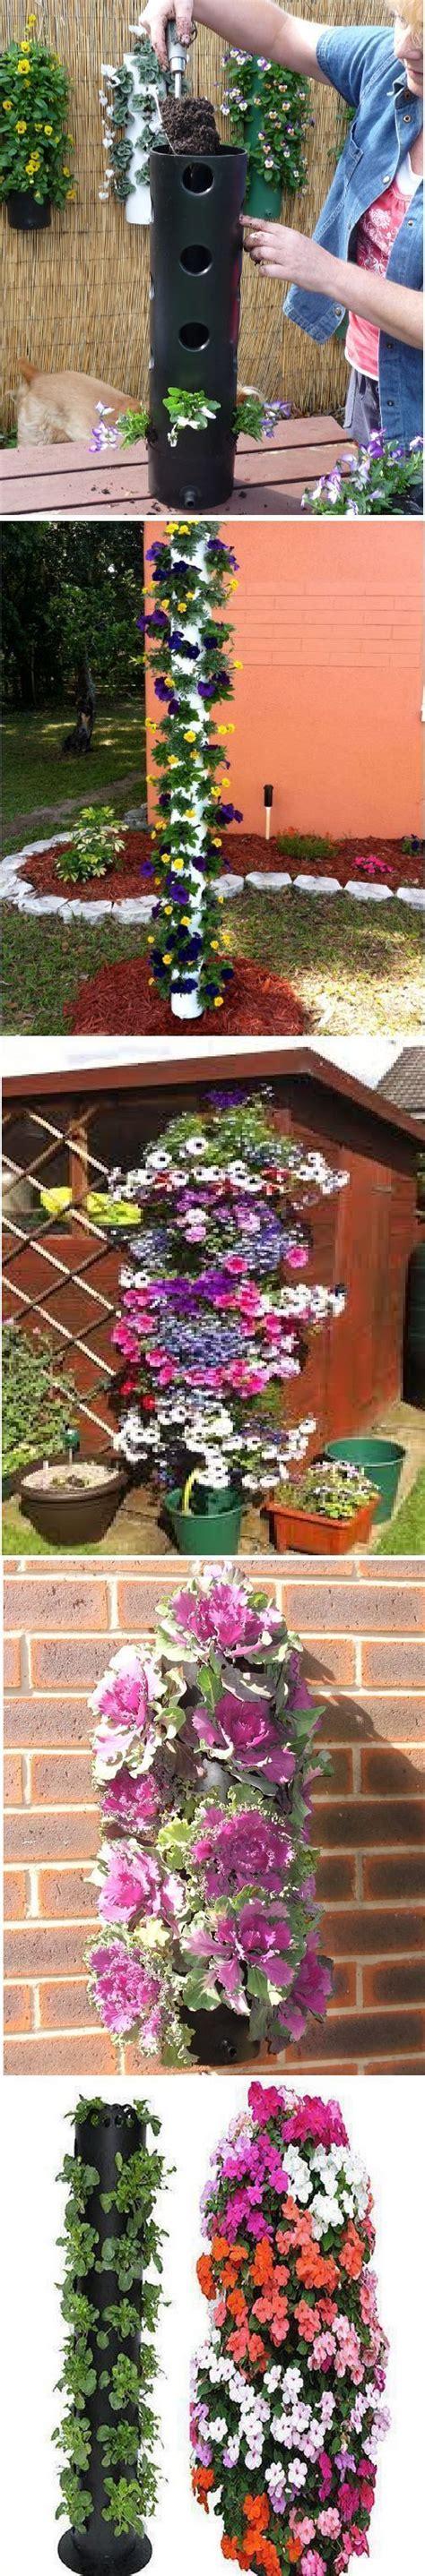 Polanter Vertical Gardening System by Polanter Vertical Gardening System Garten Diy